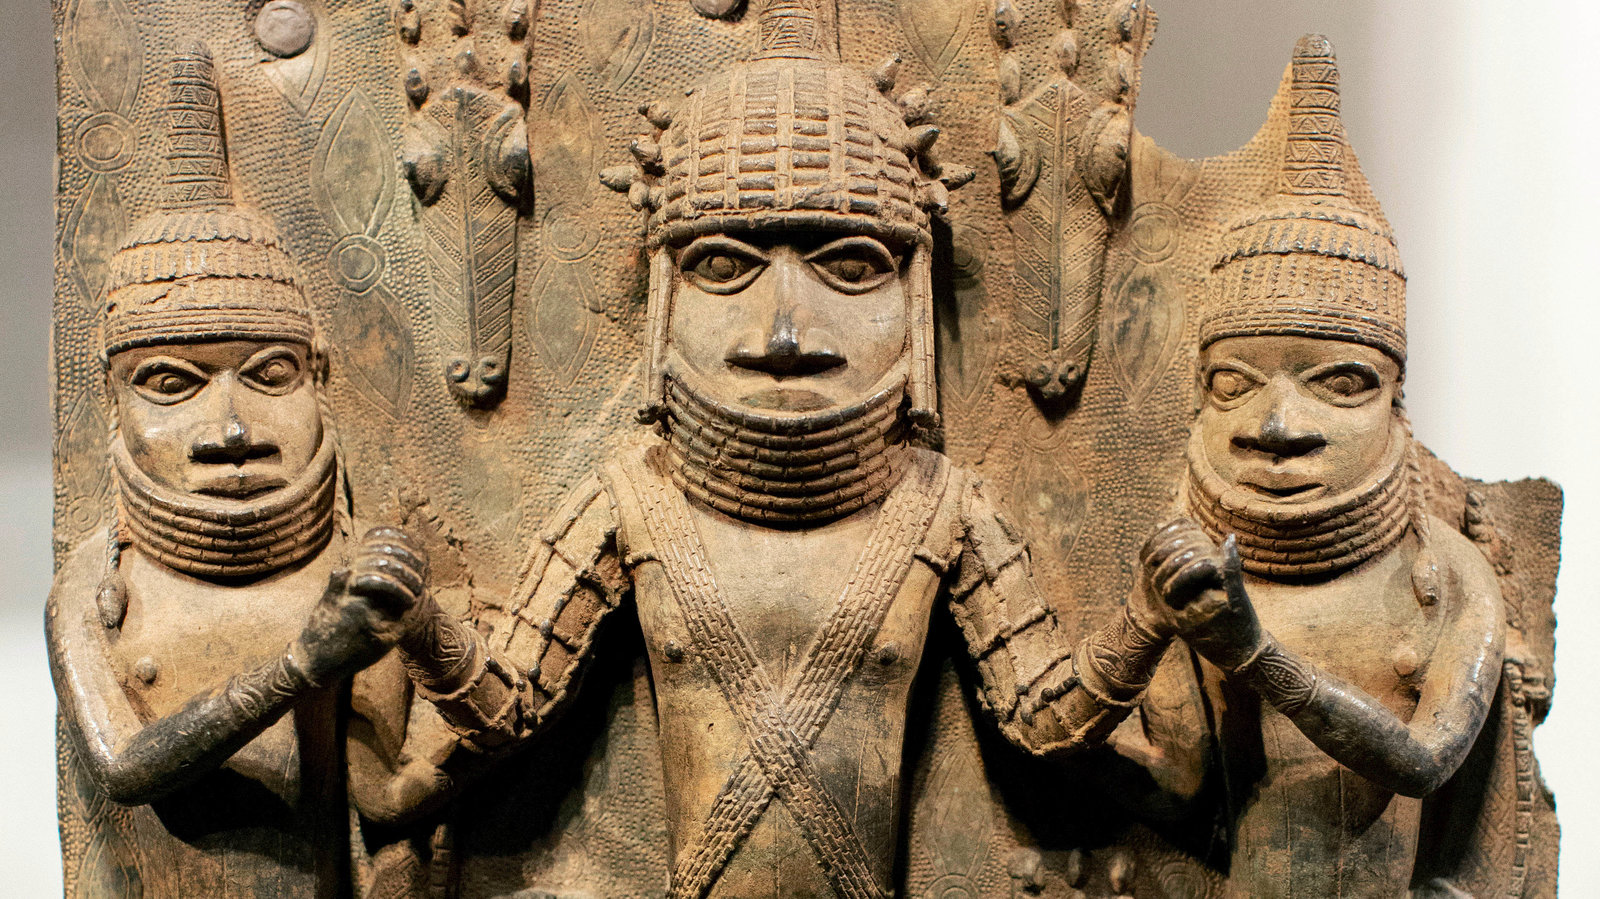 Stolen African Art must be Returned